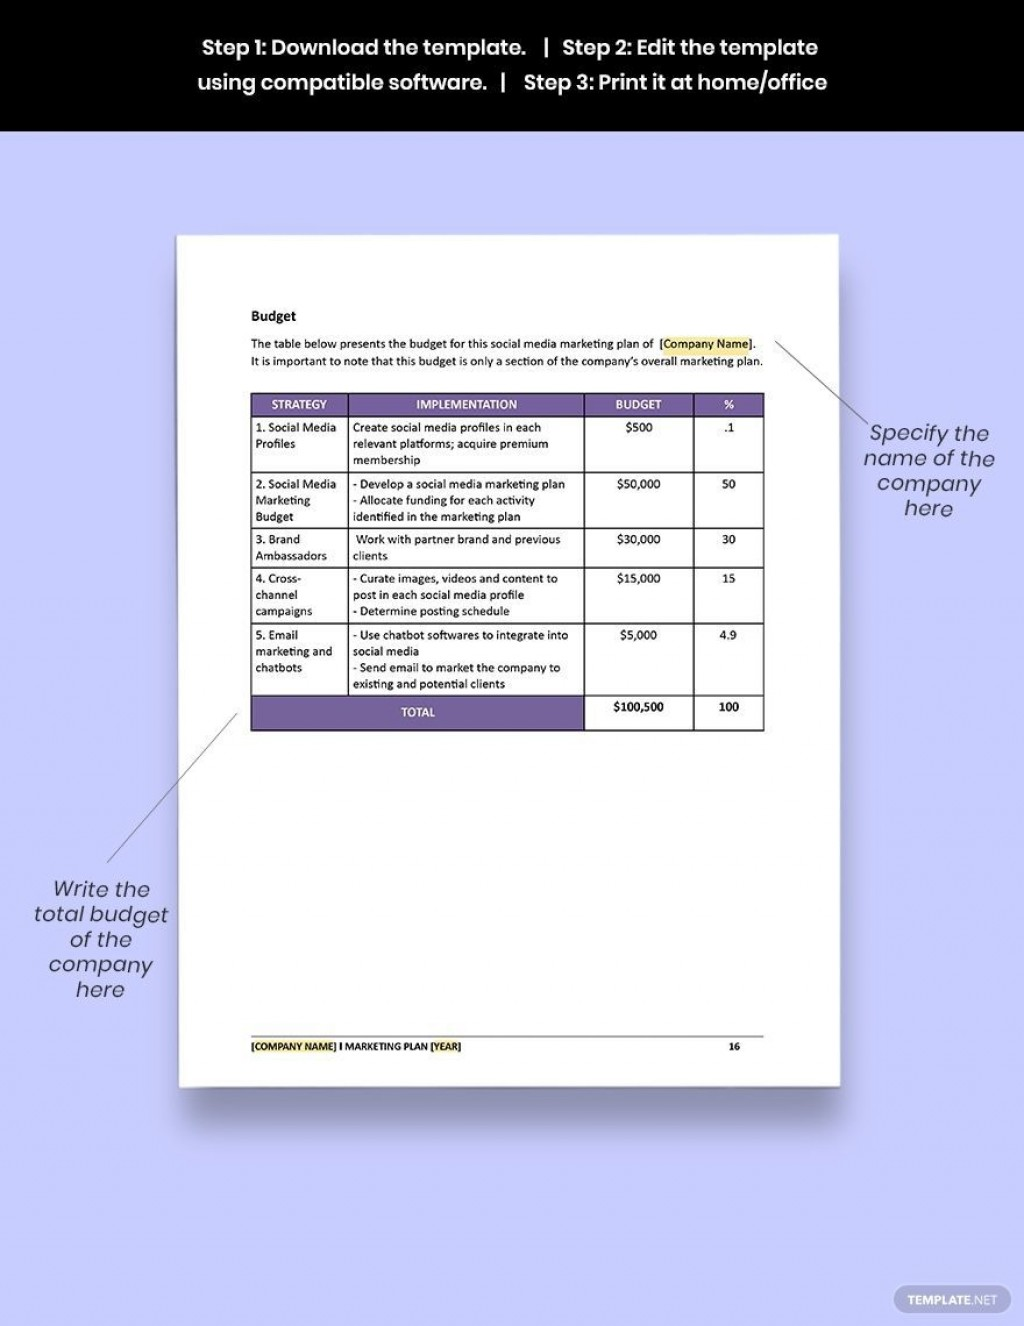 005 Unusual Social Media Marketing Plan Template Doc High Definition Large